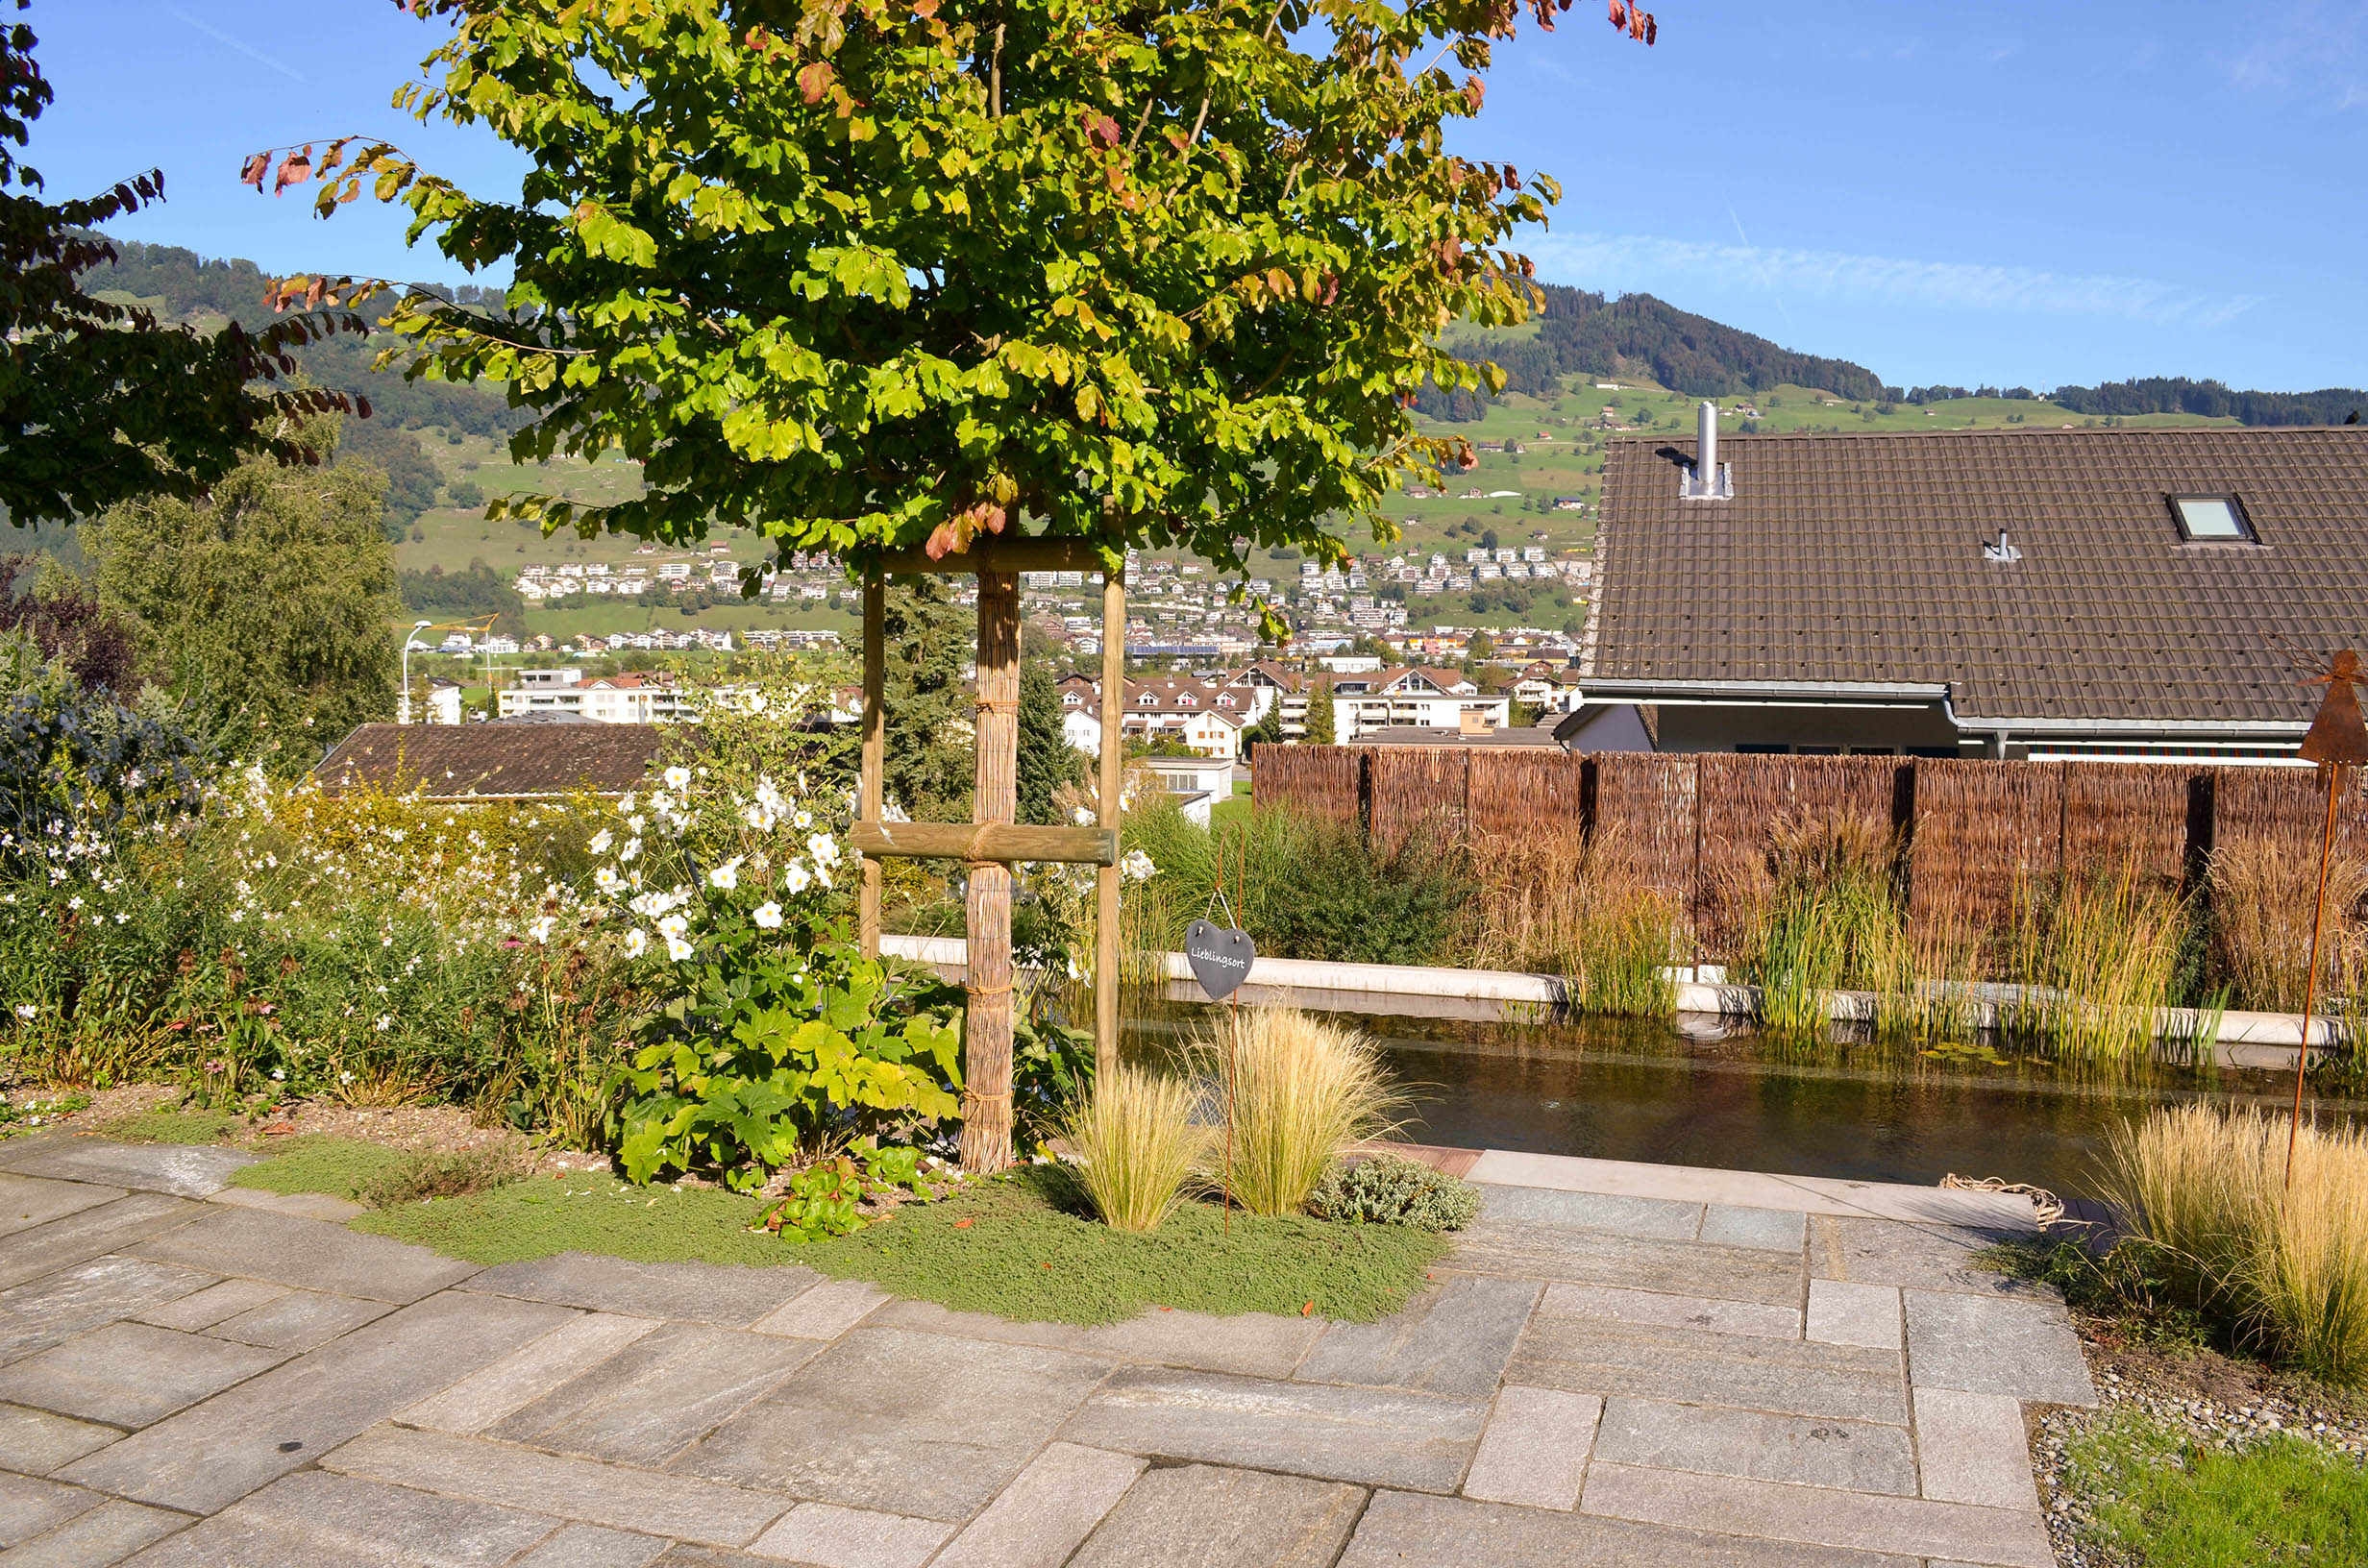 Gartenoase in Buochs 3